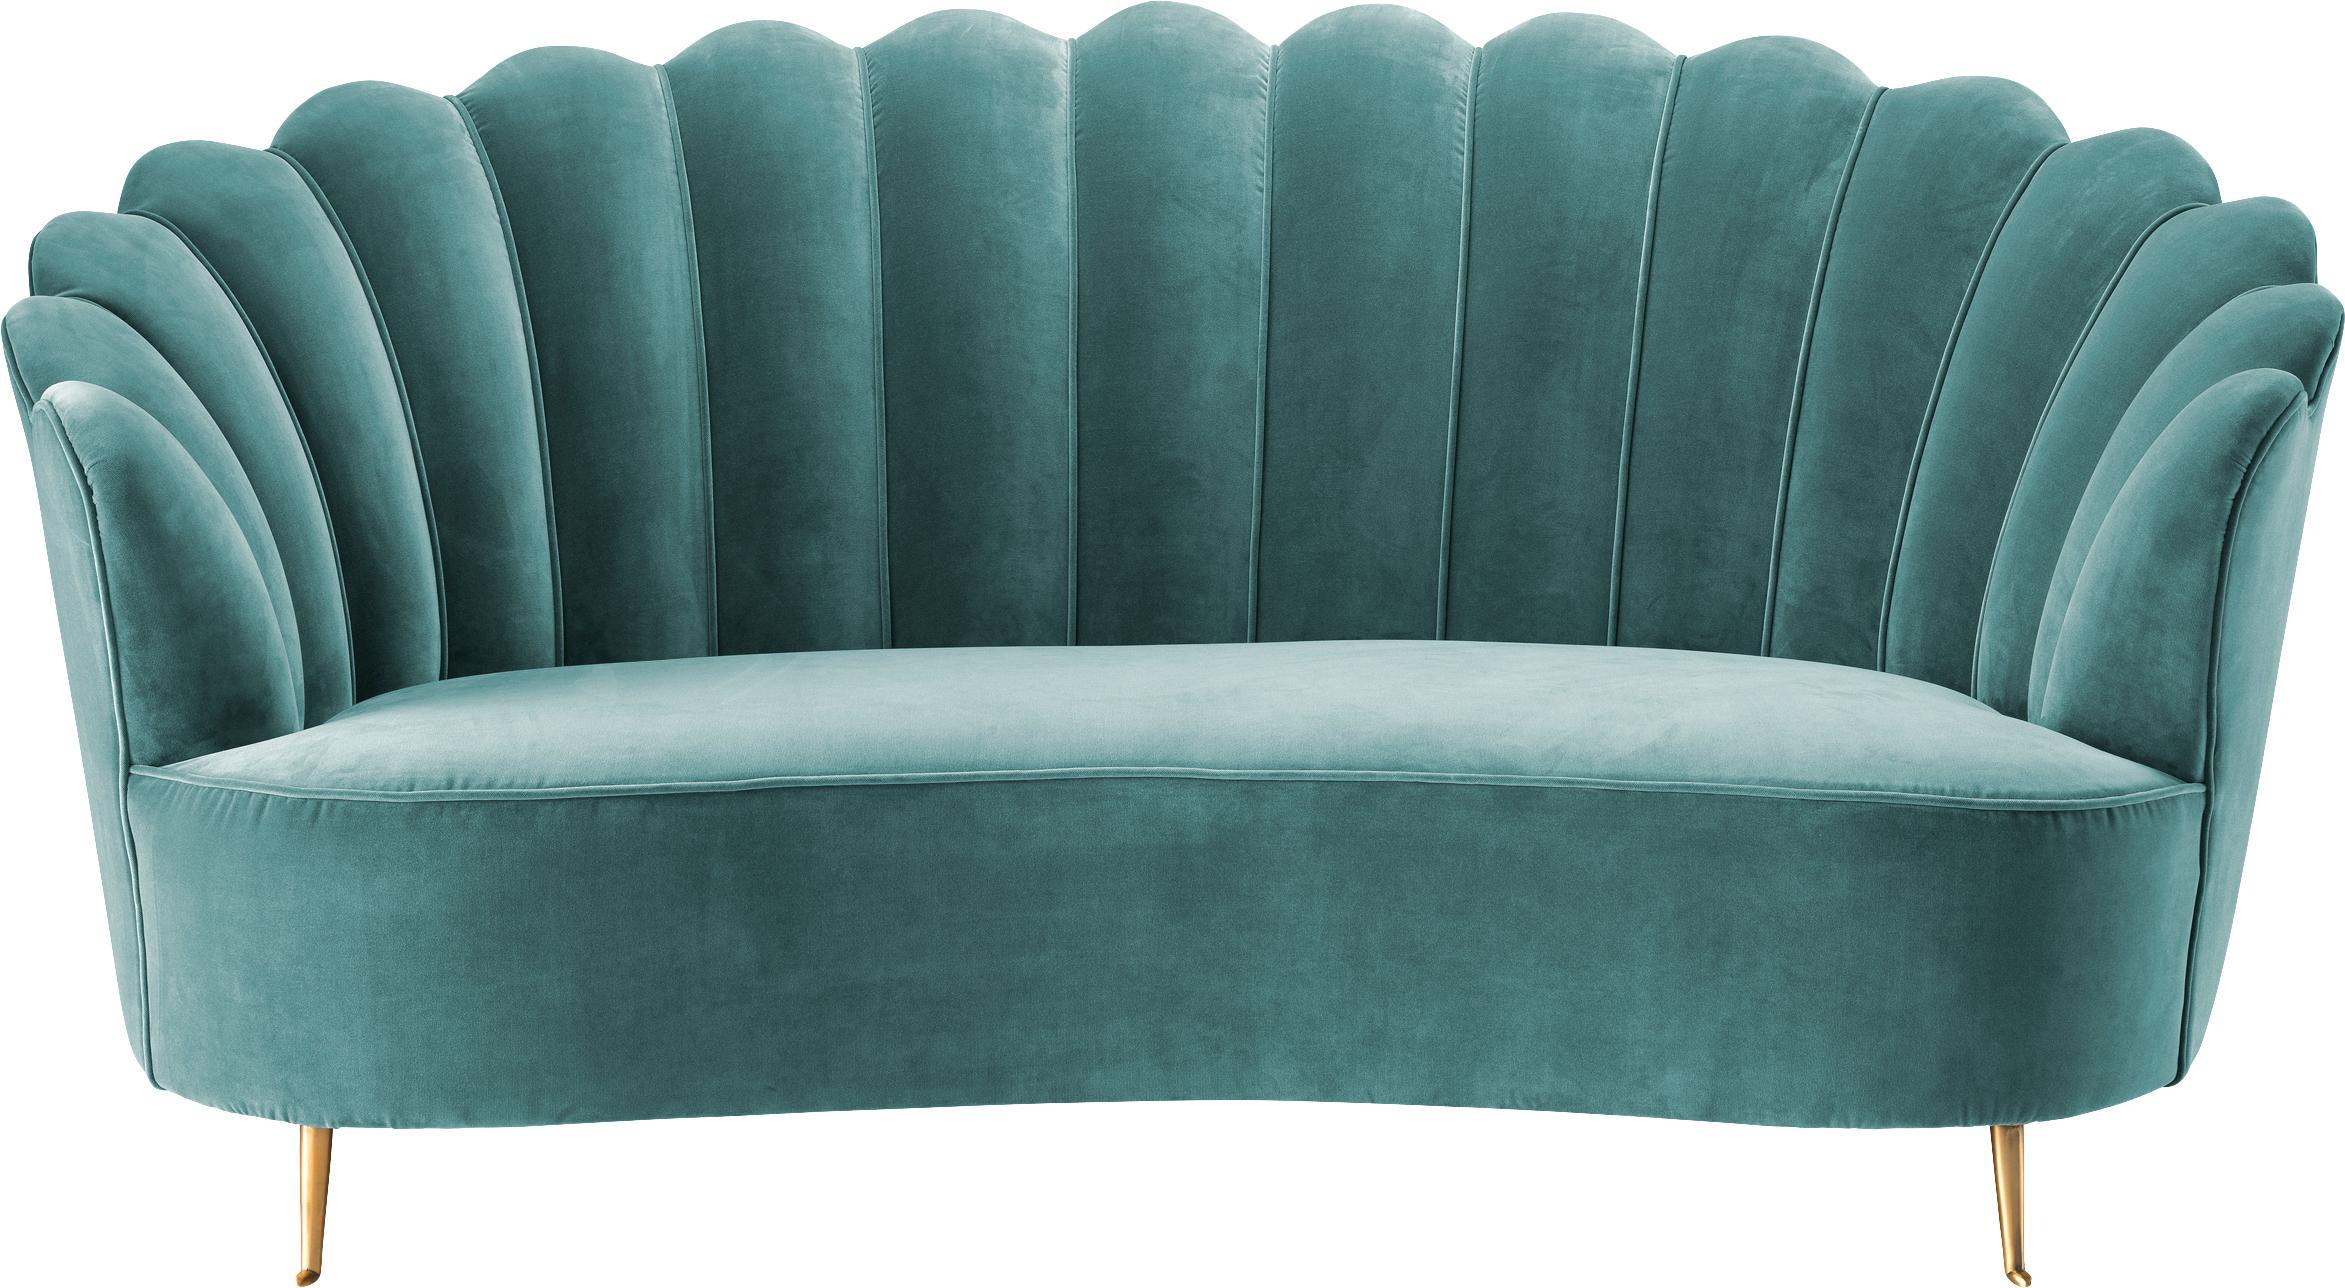 Samt-Sofa Messina (2-Sitzer), Bezug: 95% Polyester, 5% Baumwol, Füße: Edelstahl, messingbeschic, Samt Türkis, B 180 x T 95 cm